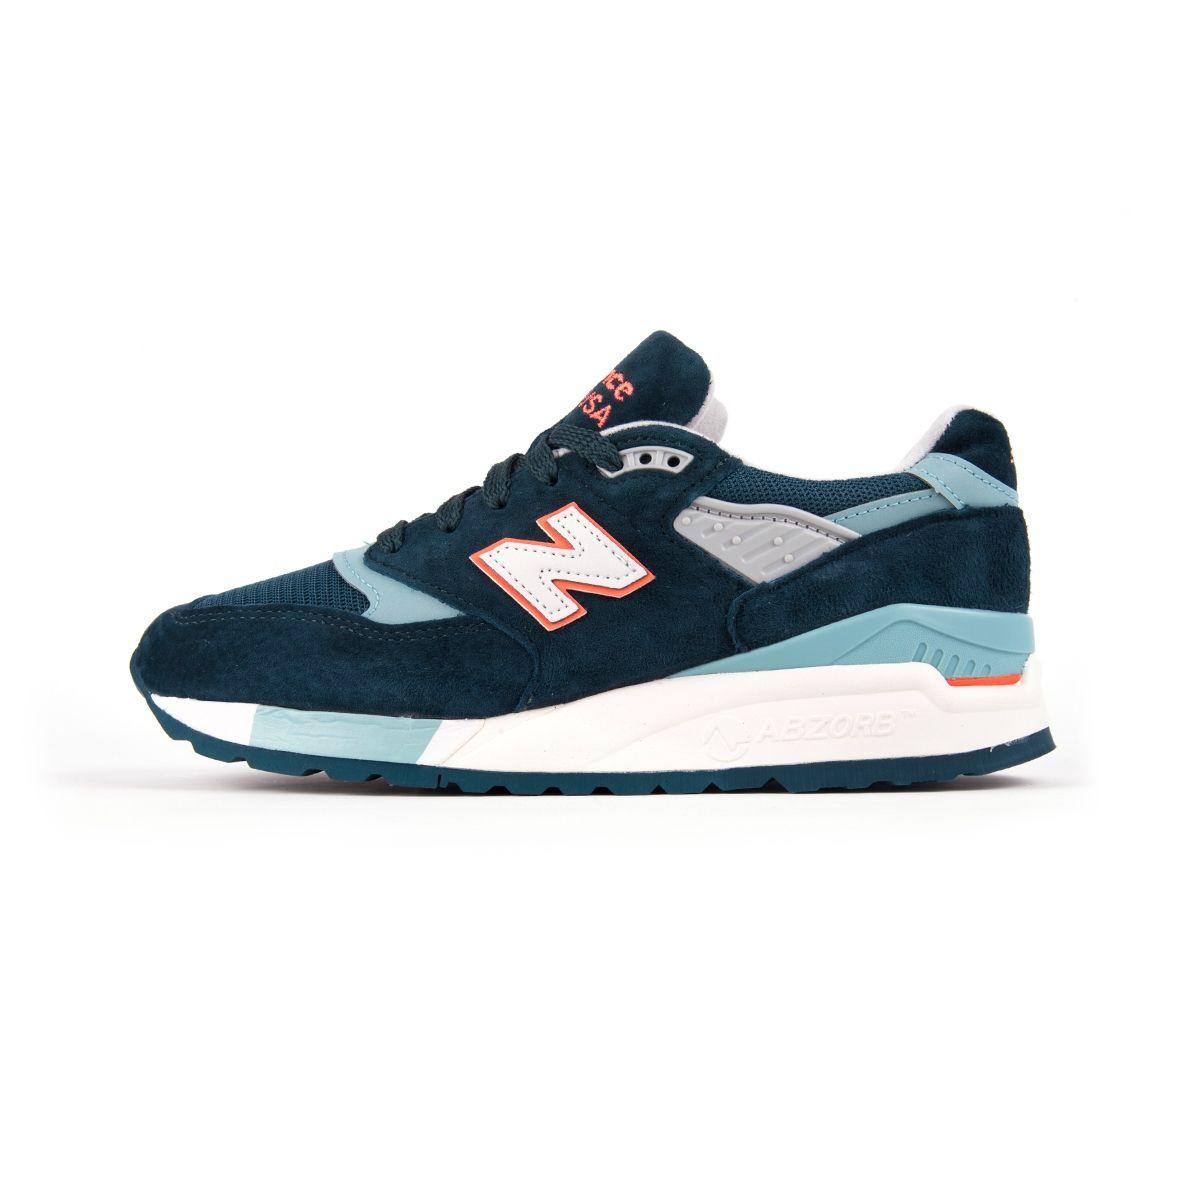 Balance Agfbvawq Shoelosophy Made 998 In New Sneakers Women Usa W998cht q77wTBxX